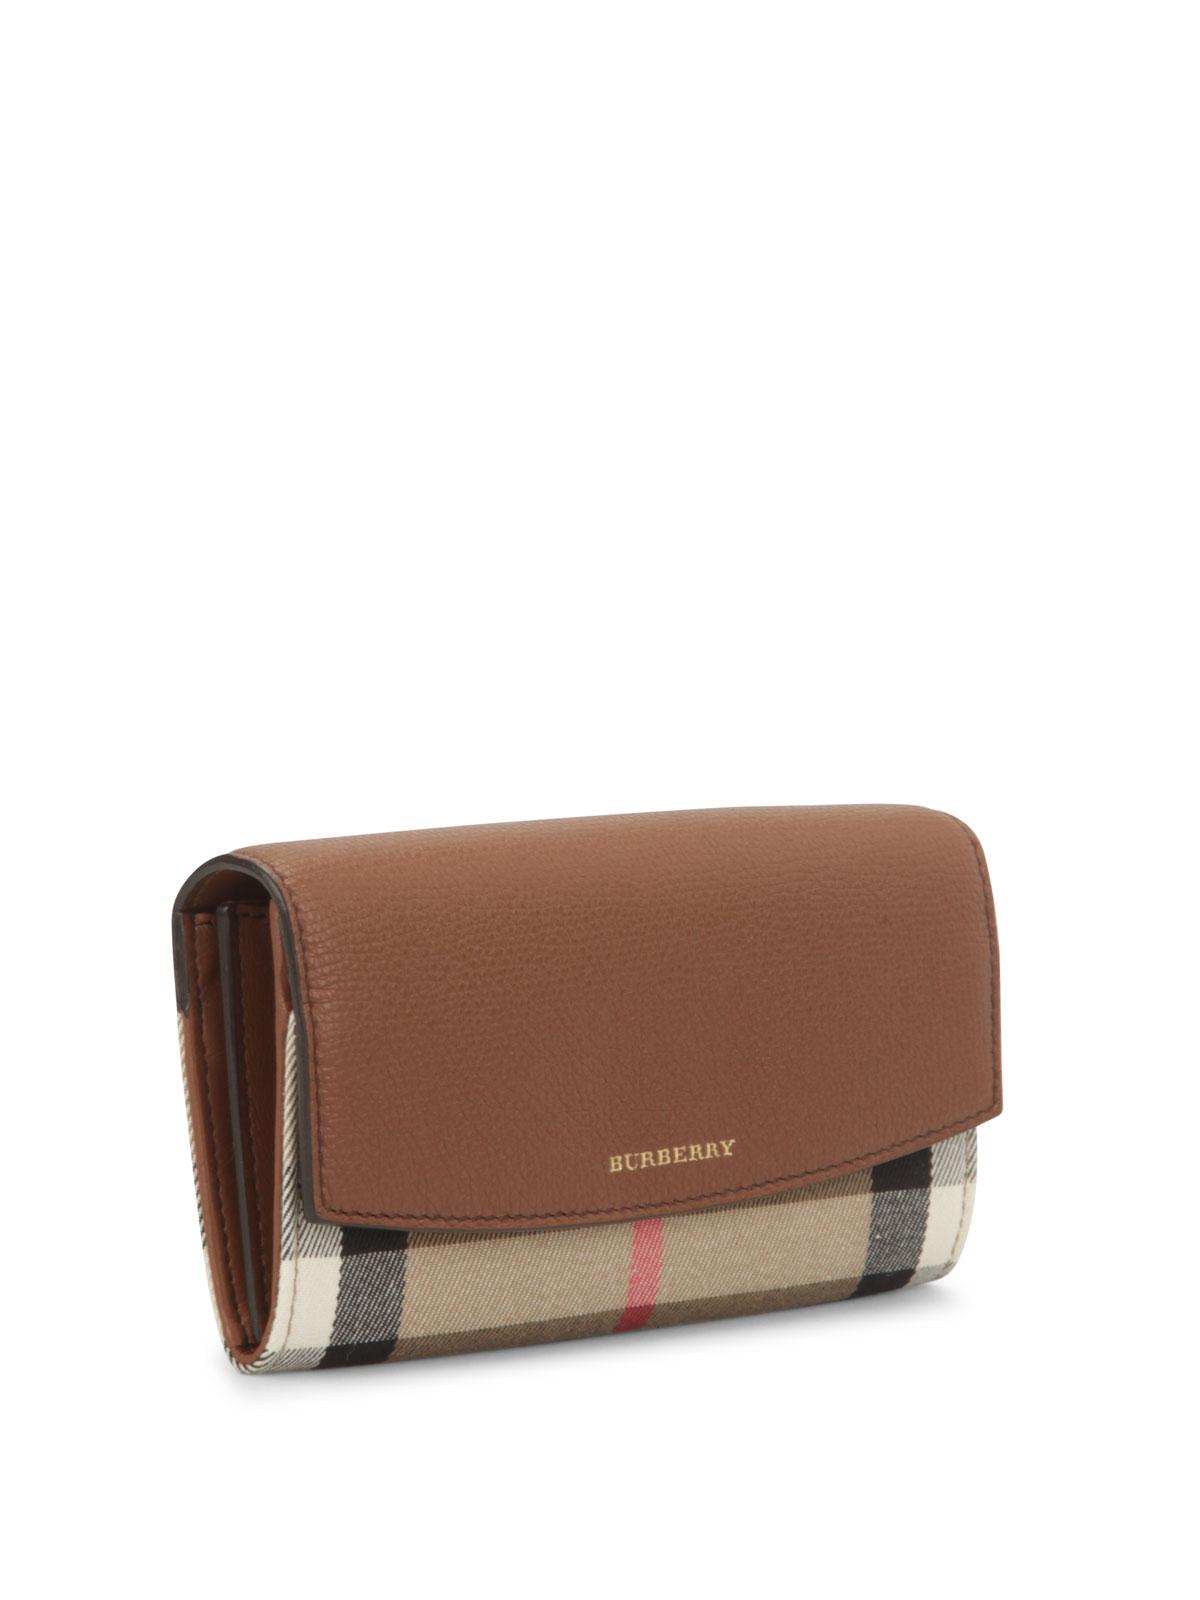 Porter Wallet By Burberry Wallets Purses IKRIX - Porte monnaie burberry